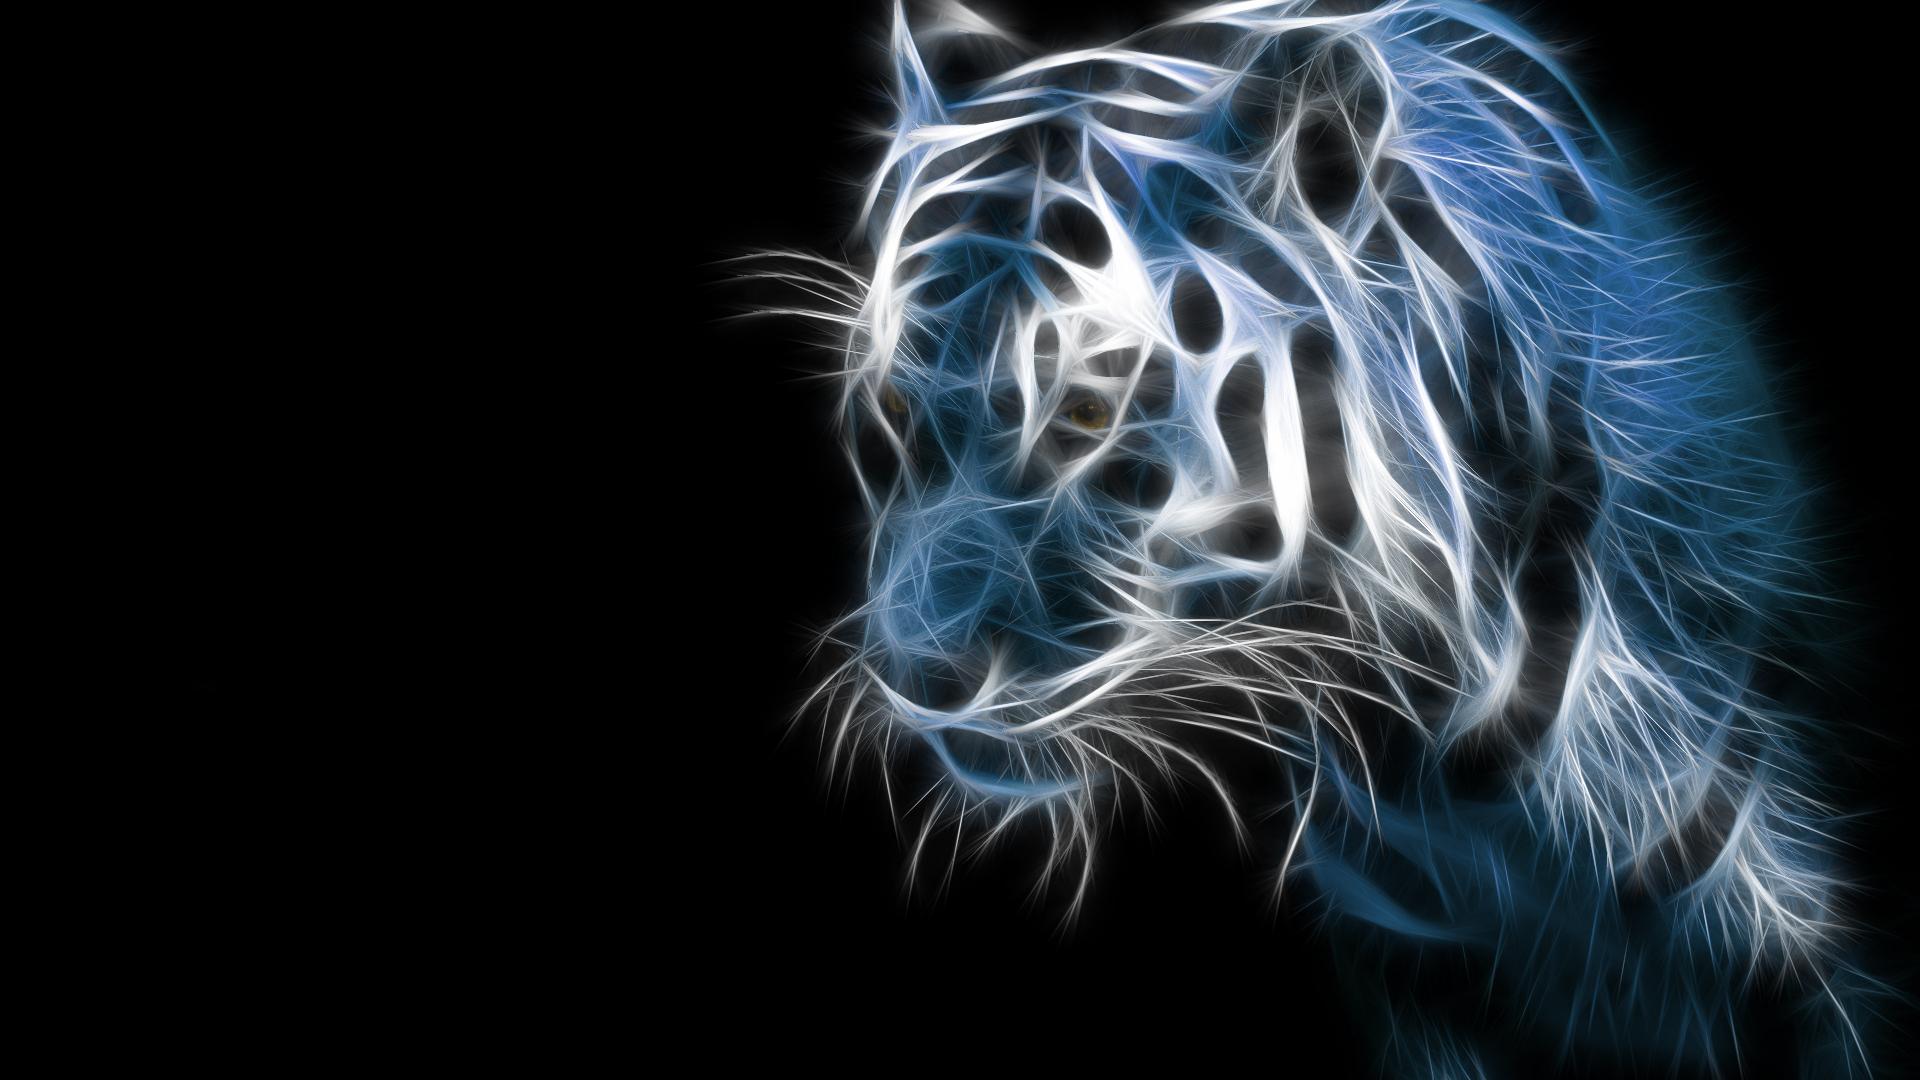 Download Tiger Animal Wallpaper 1920x1080 Full HD Wallpapers 1920x1080